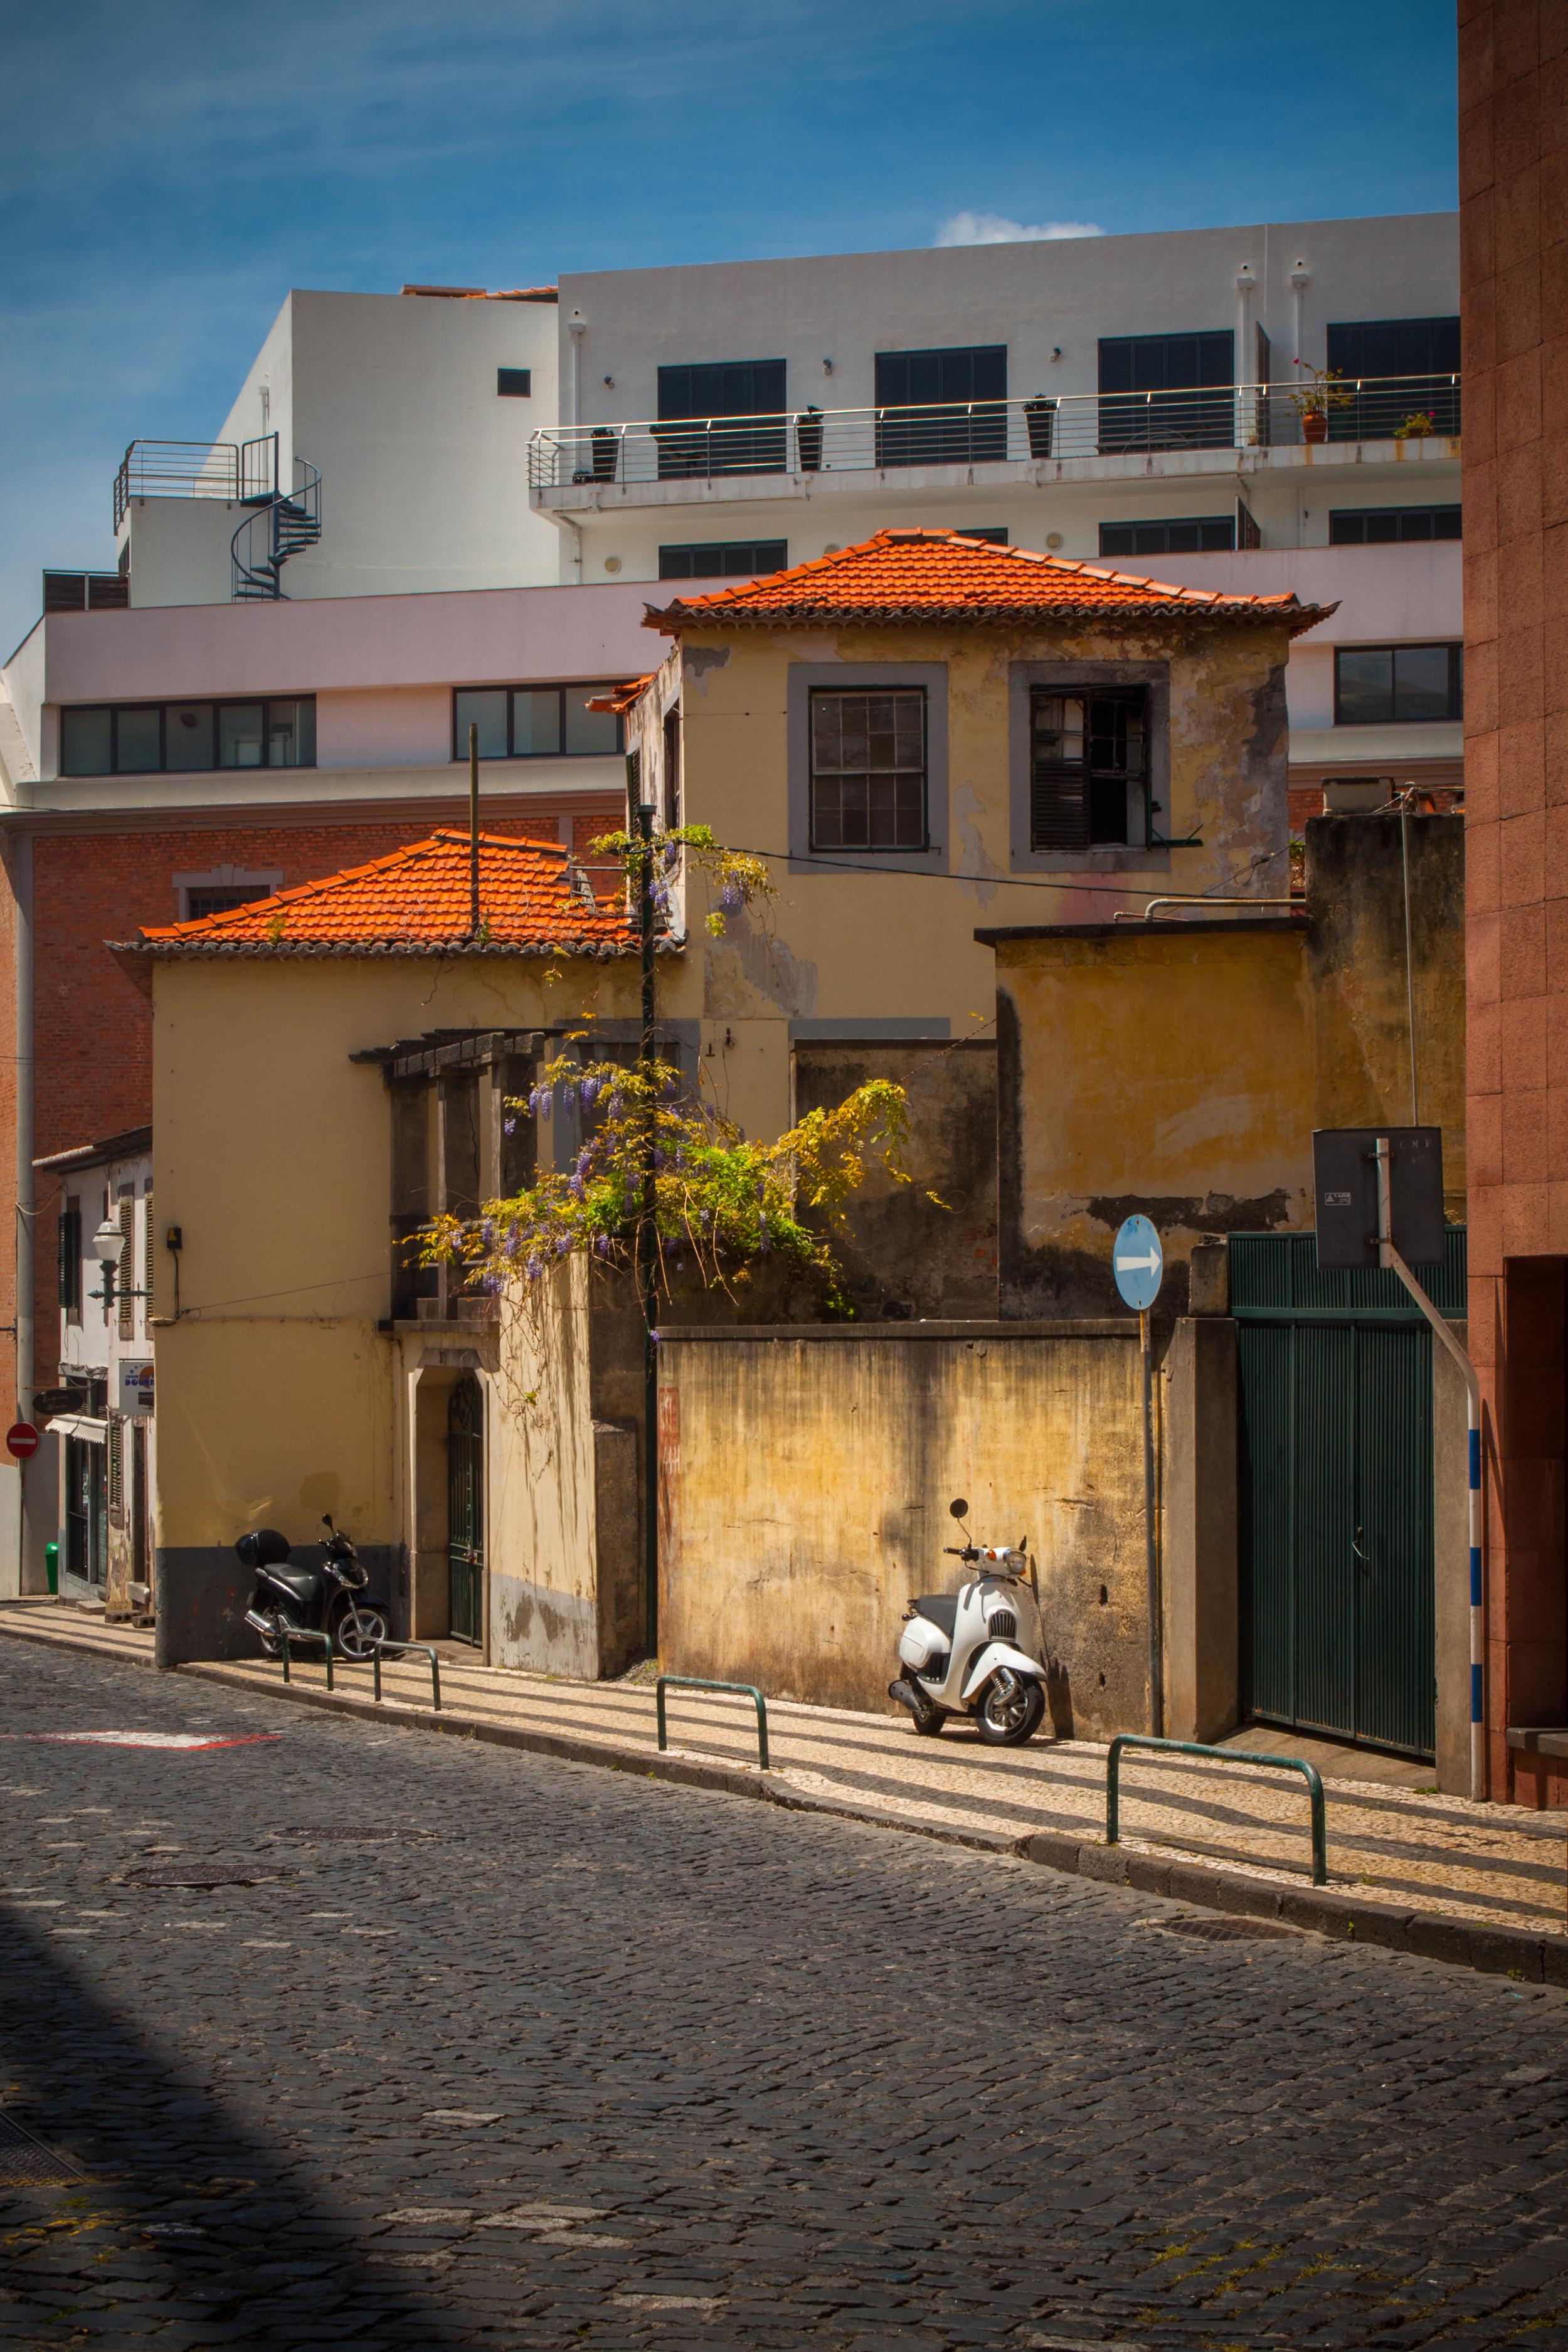 Madera - 150425 - DSC_4208.JPG